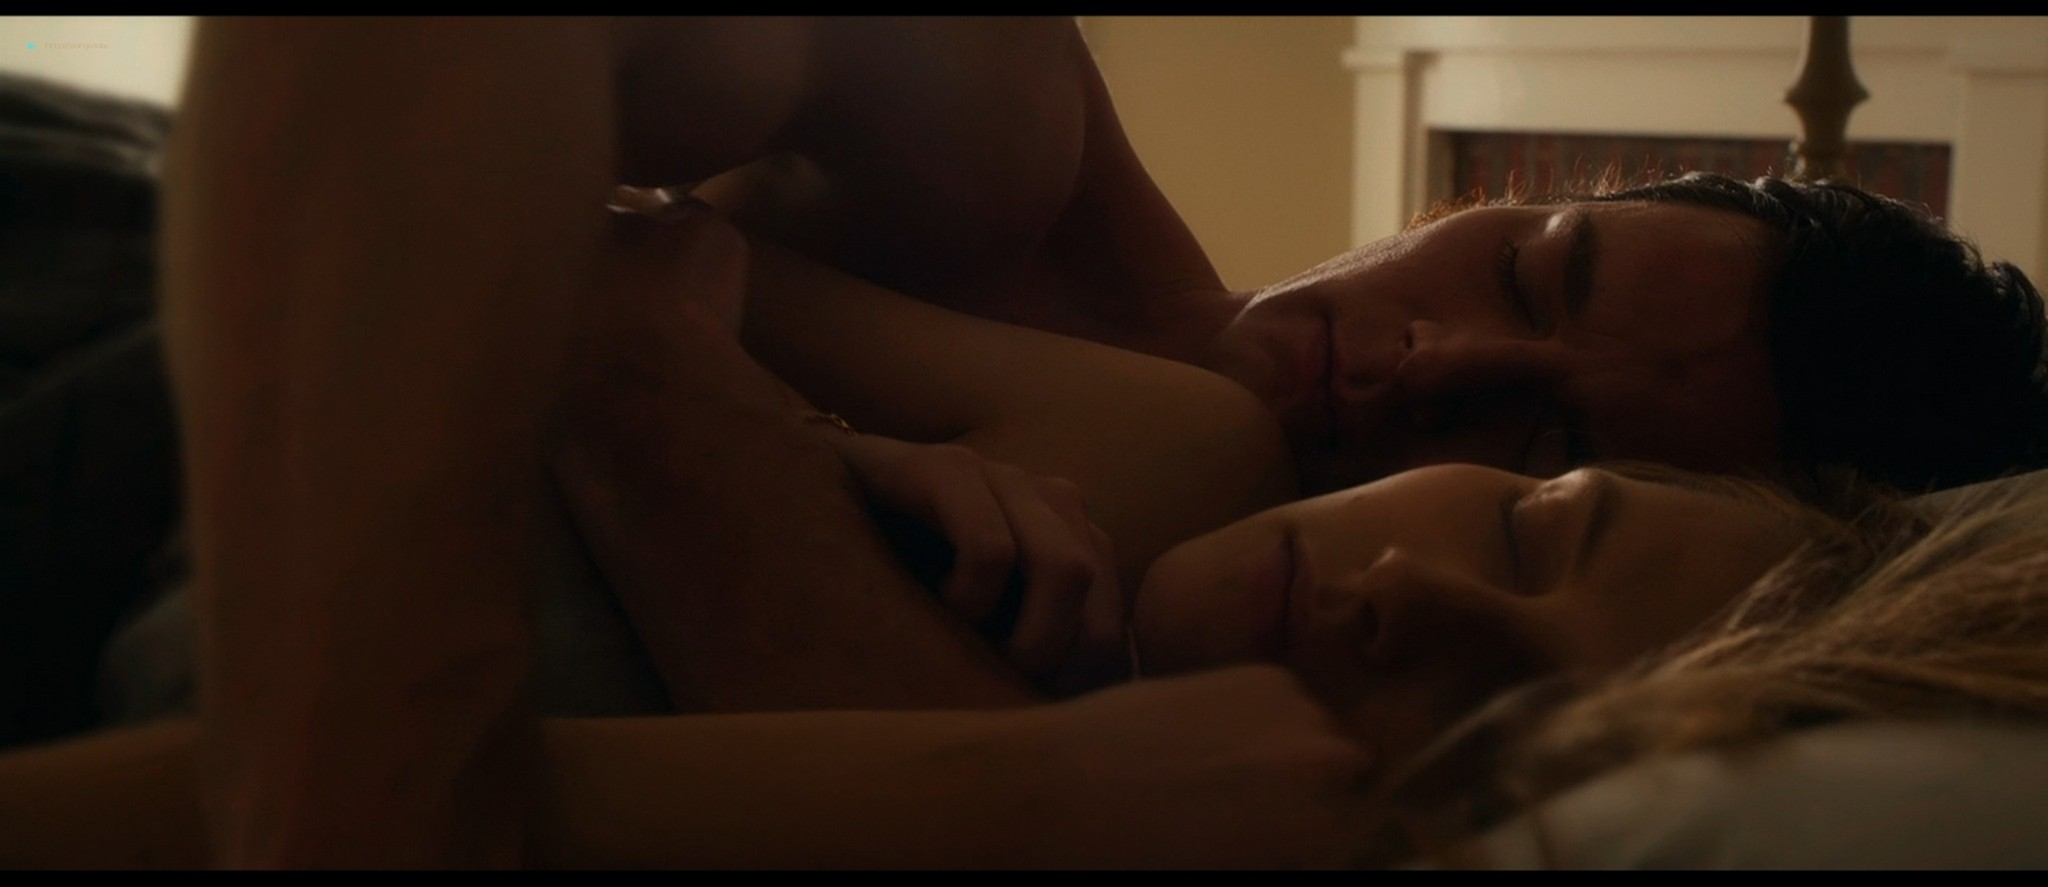 Teresa Palmer hot bikini and Maggie Grace, Alexandra Daddario hot too - The Choice (2016) HD 1080p BluRay (2)